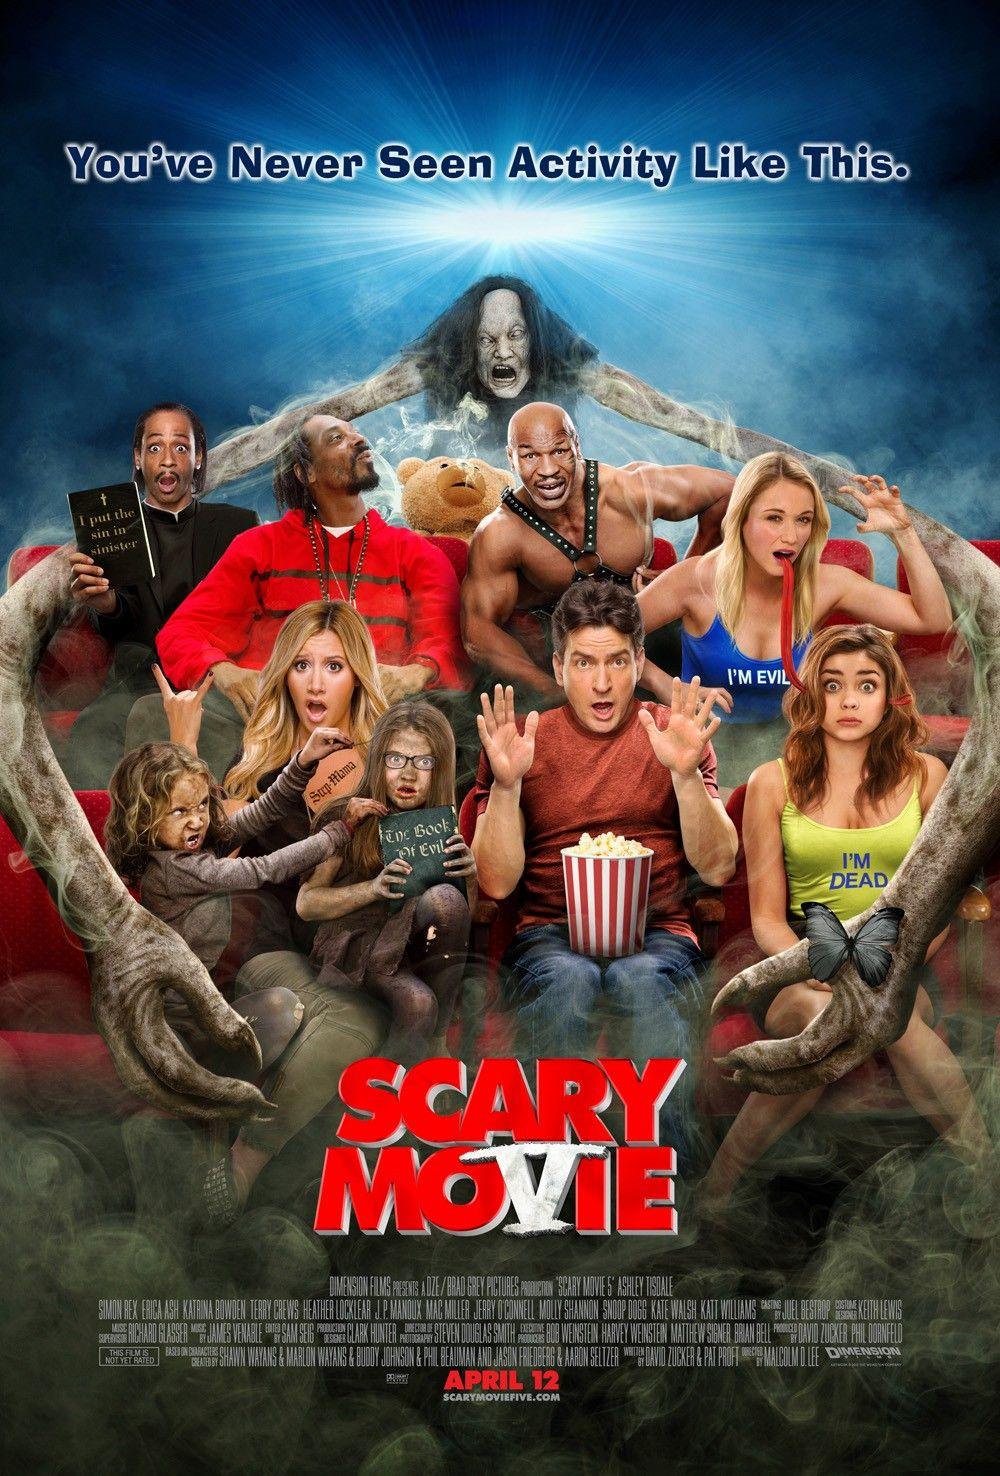 Scary Movie 5 2013 Scary Movie 5 Movies To Watch Movie Posters